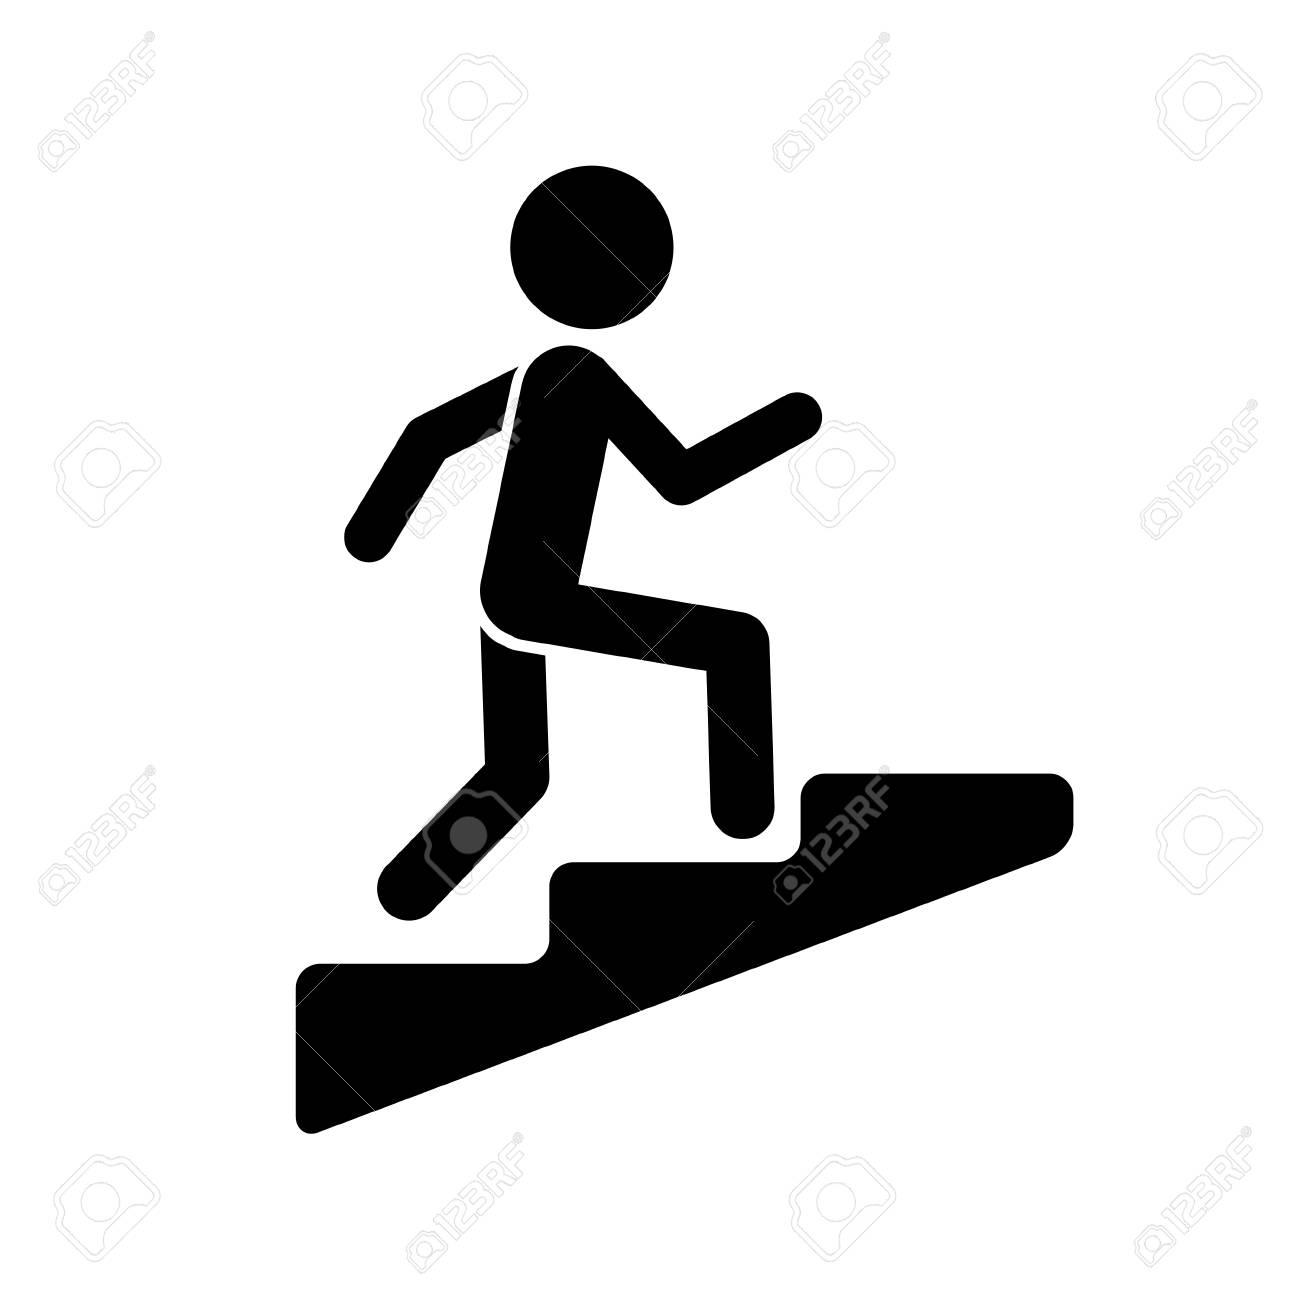 Upstairs. Man climbing the stairs. Career symbol.